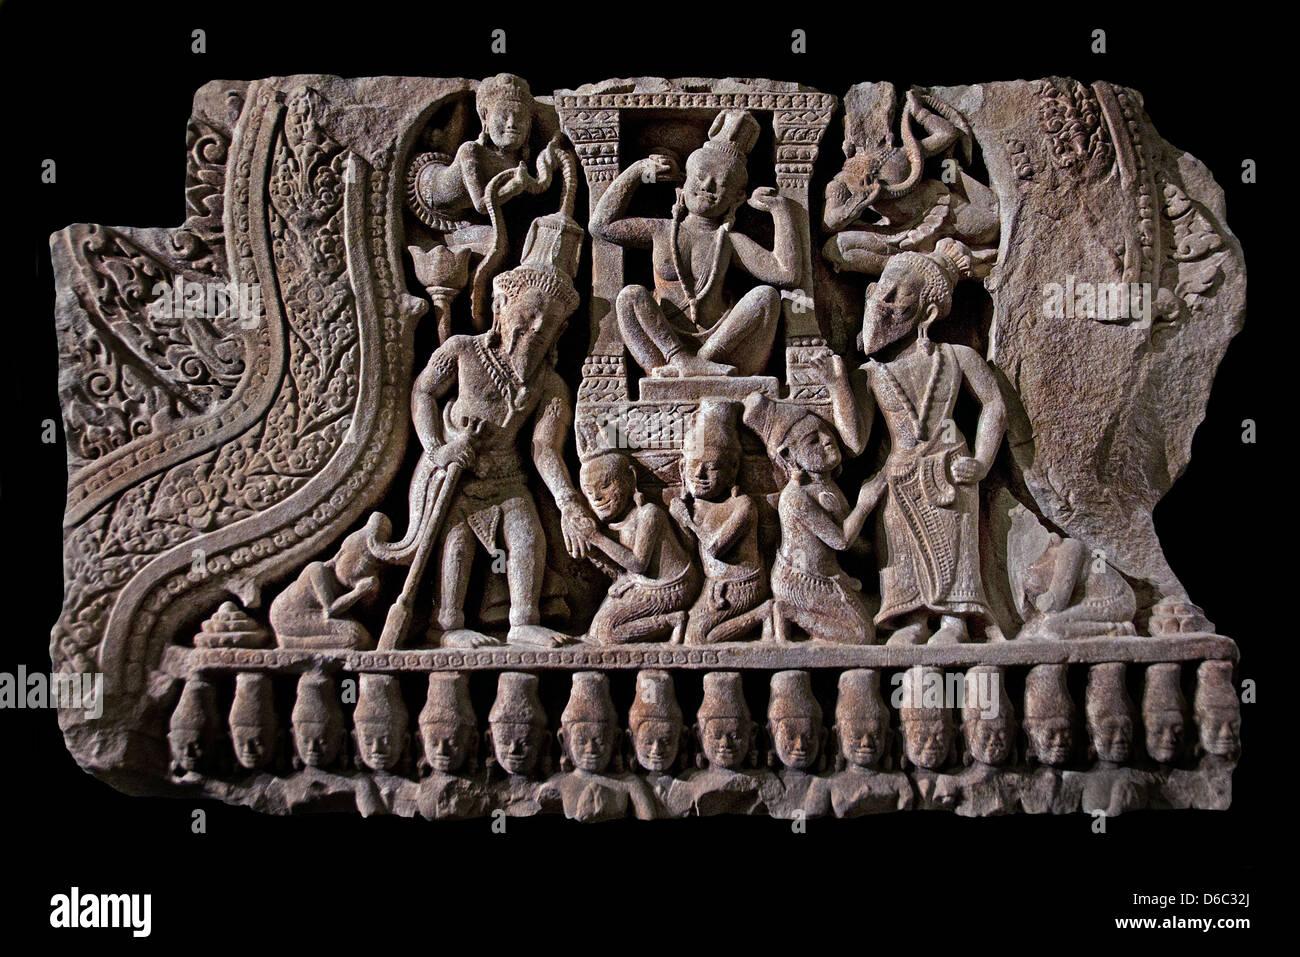 Goddess Parvati refusing to listen to Shiva's proposals pediment fragment 13th century AD Khmer Bayon style - Stock Image